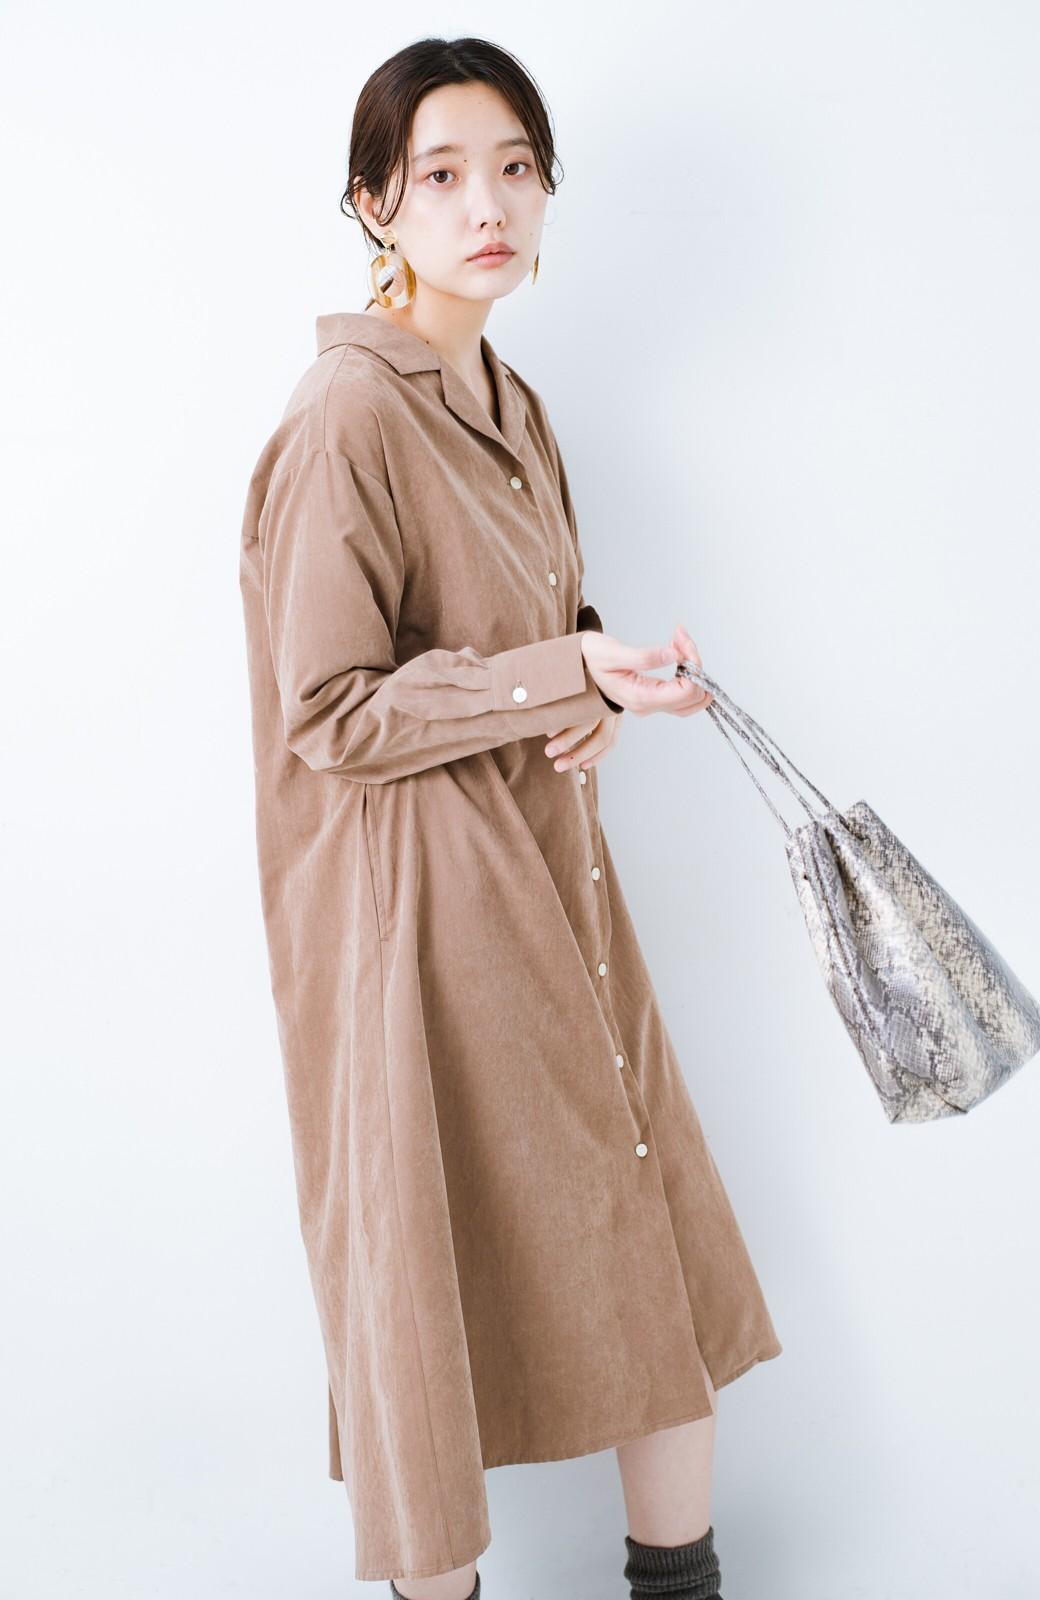 haco! 太ってもばれずに羽織っても便利なAラインワンピース <ブラウン>の商品写真22